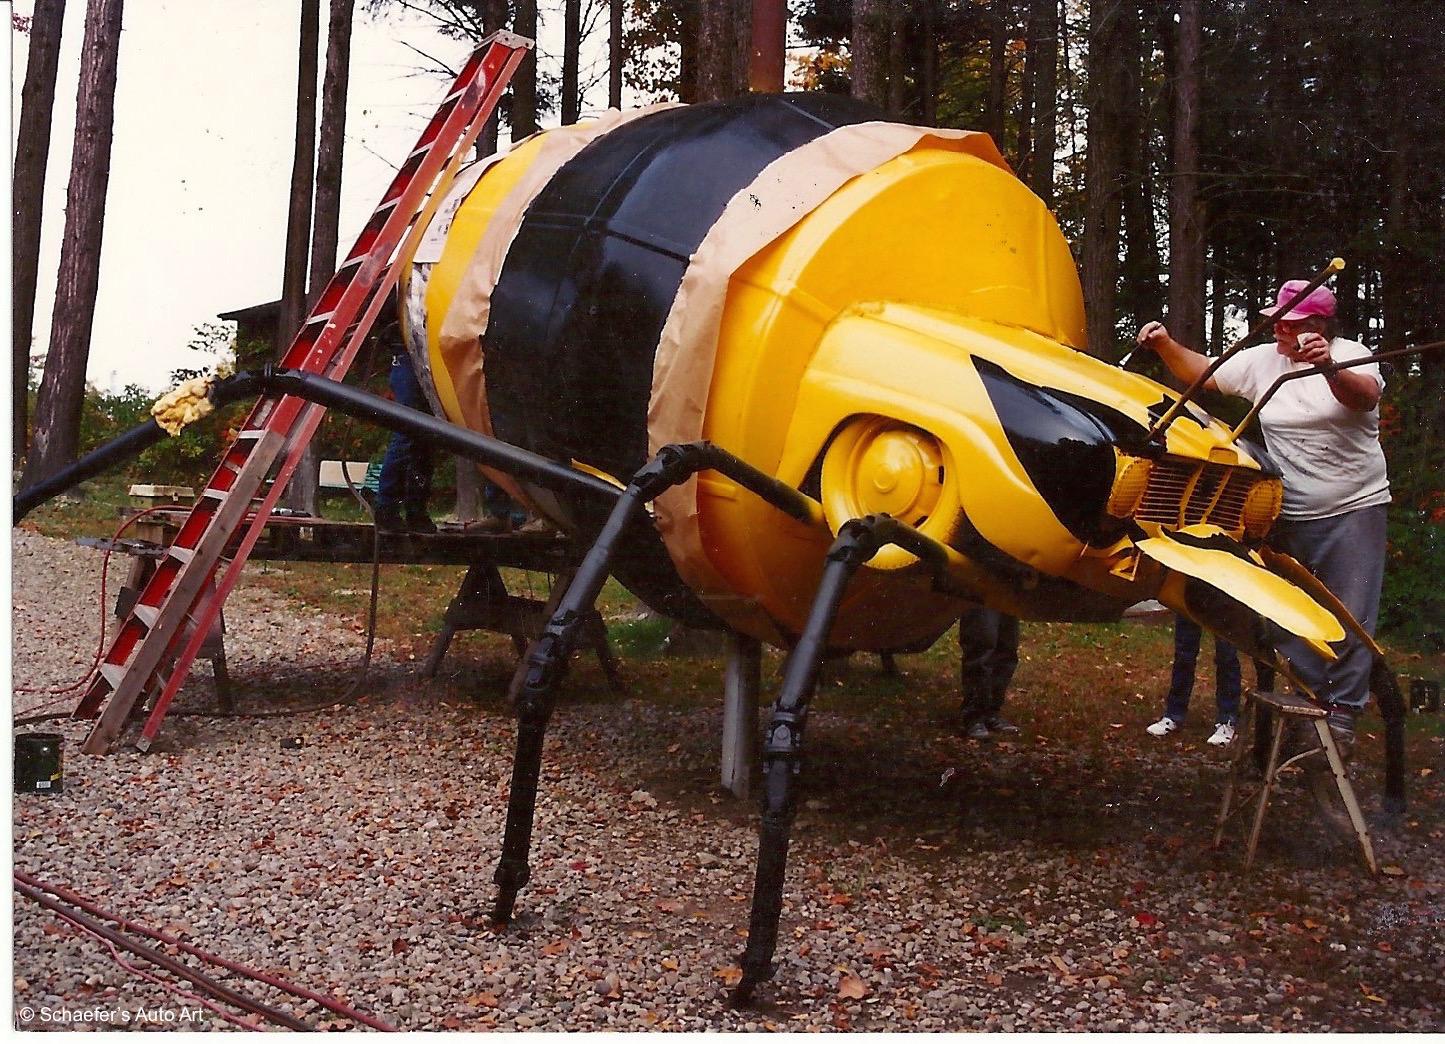 Bumblebee_Schaefers Auto Art1.jpeg